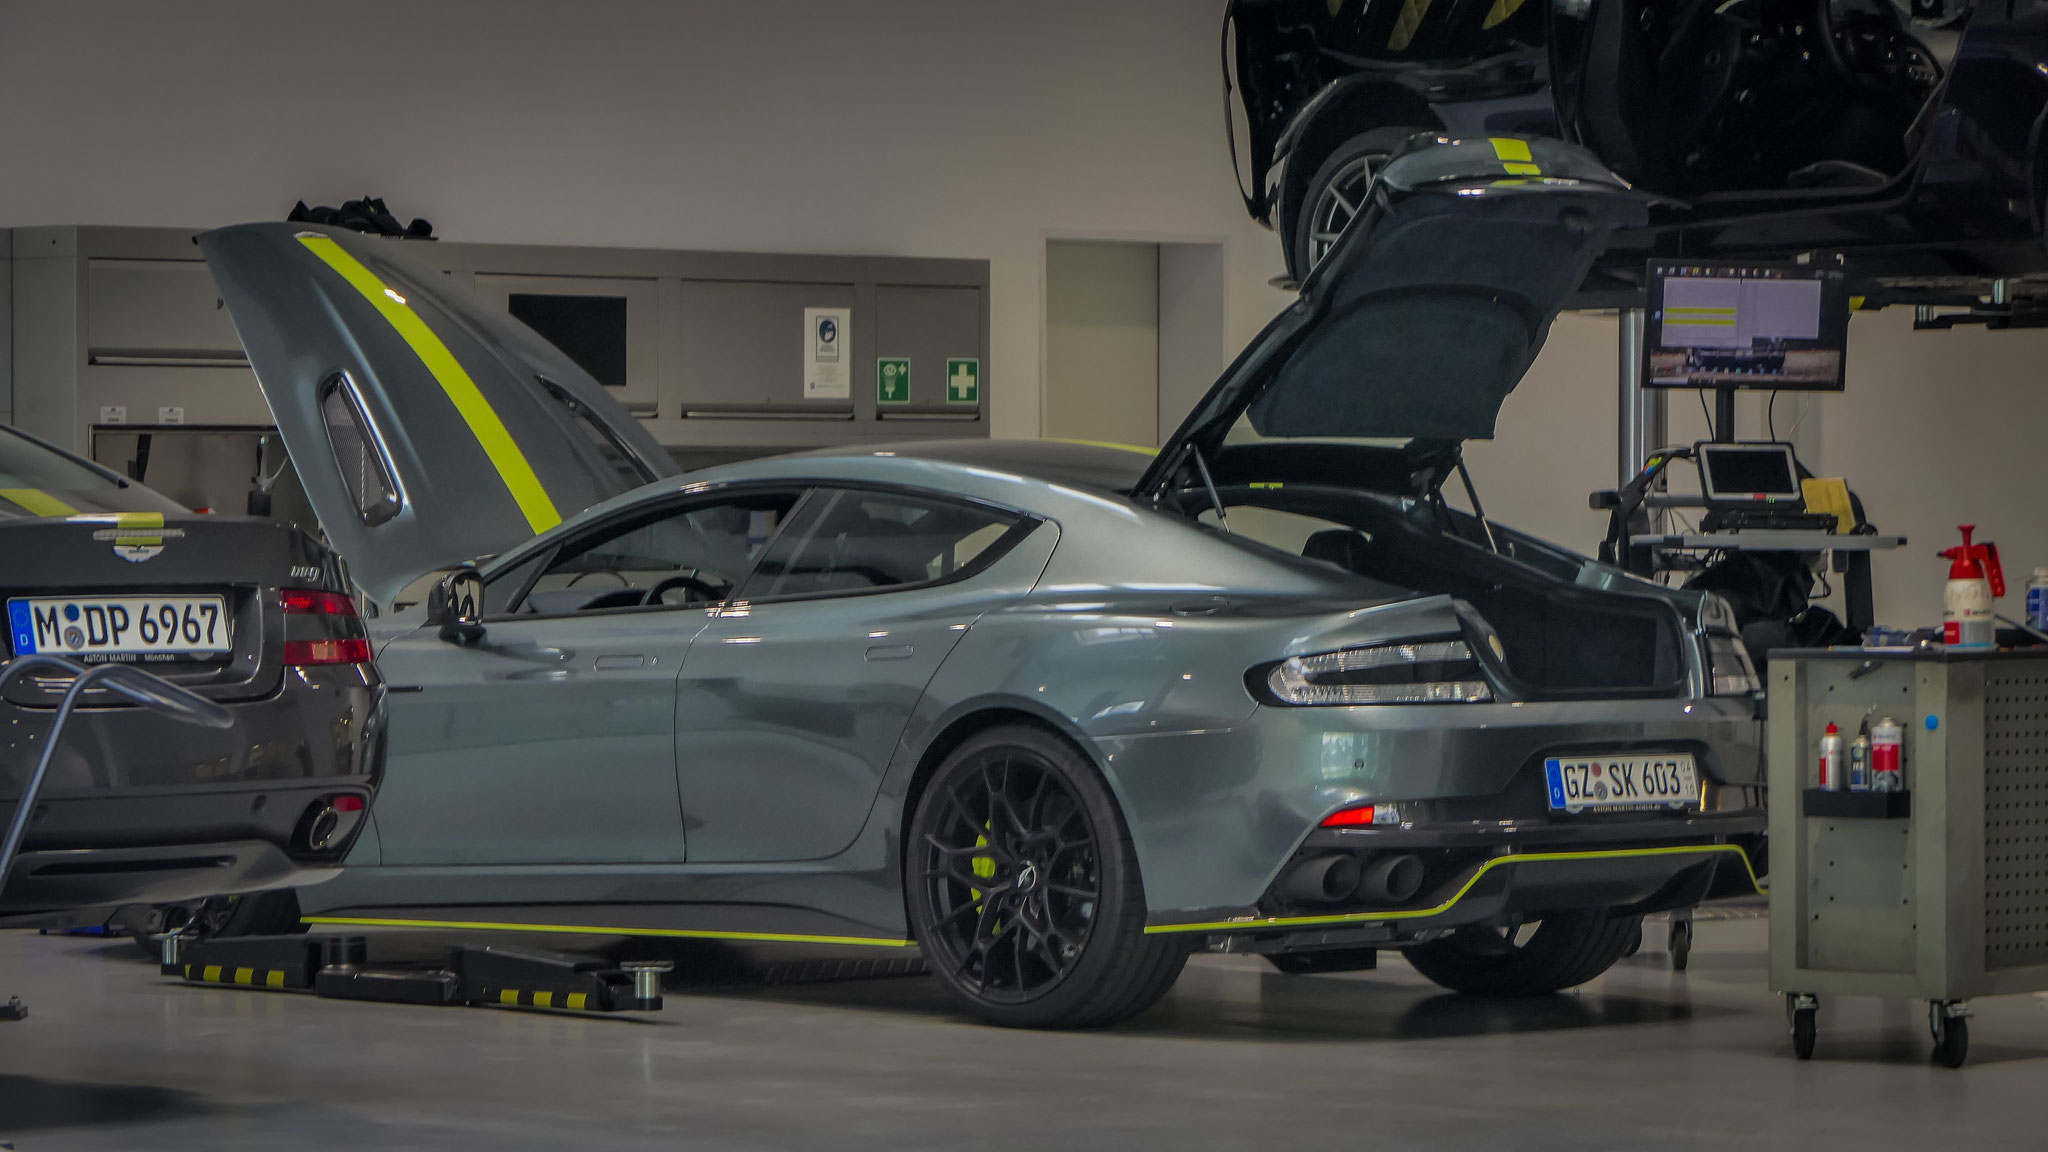 Aston Martin Rapide AMR - GZ-SK-603